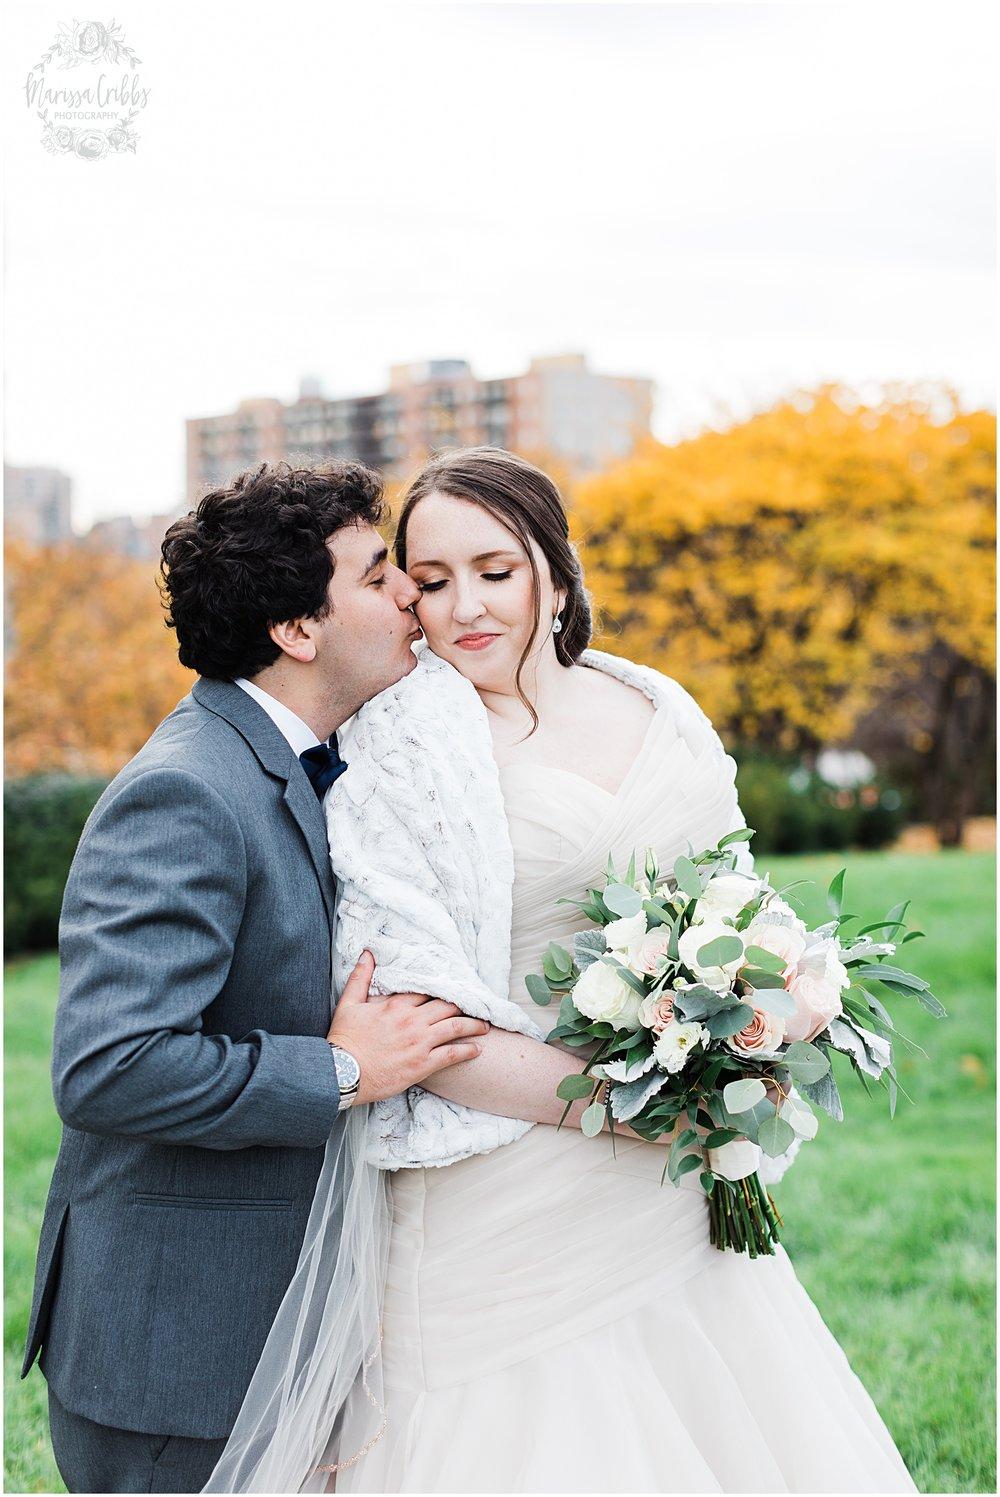 JULIA & AUSTIN MADRID THEATRE WEDDING | MARISSA CRIBBS PHOTOGRAPHY_7100.jpg